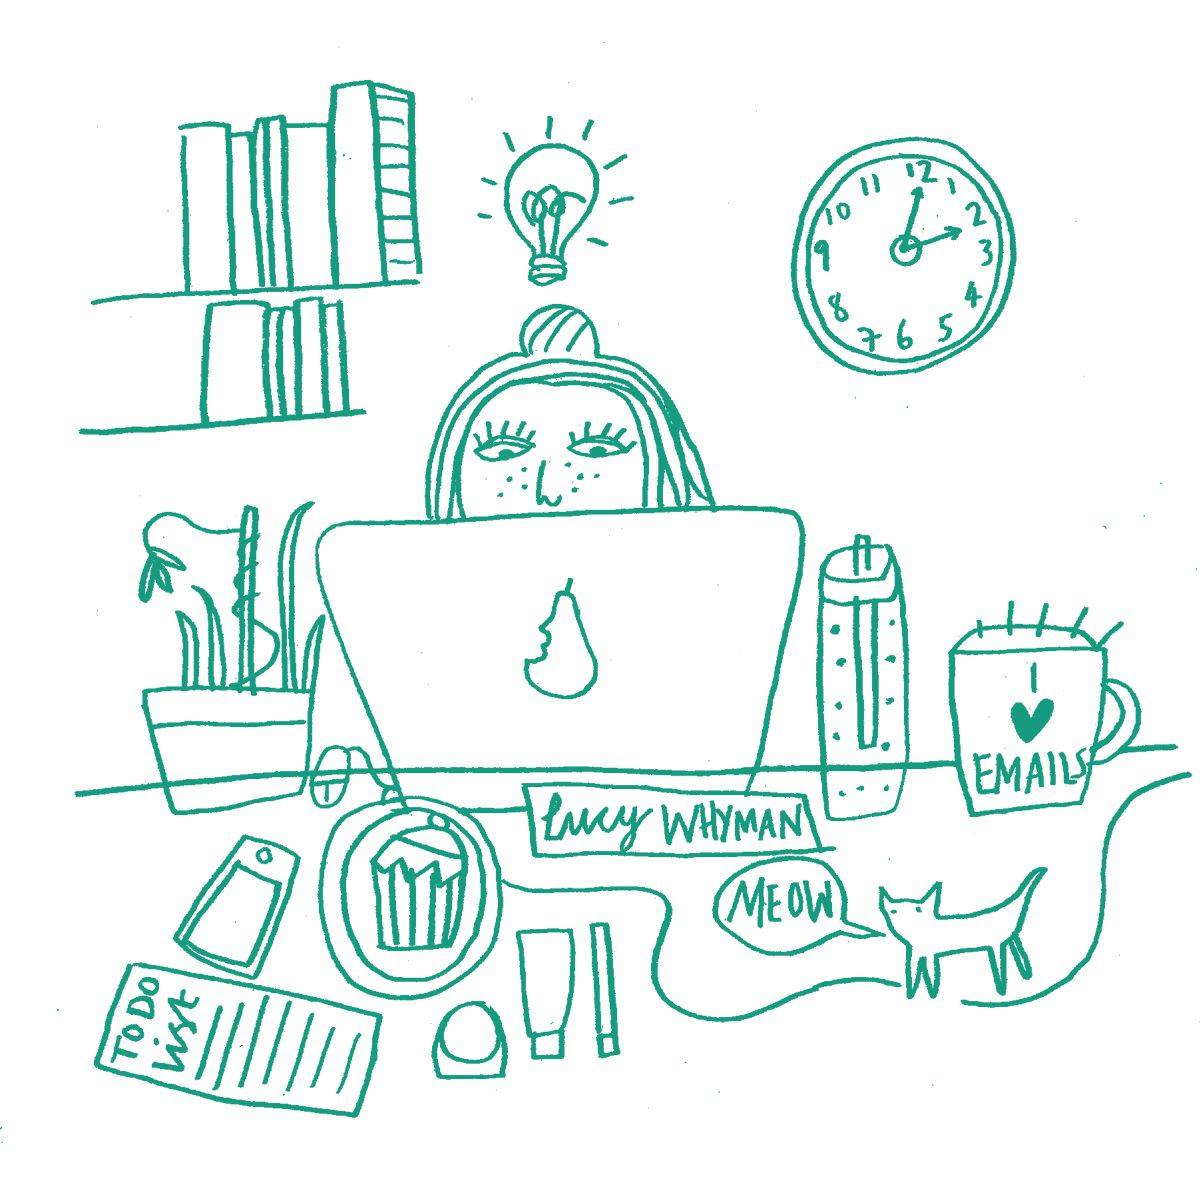 Illustration of Joules web developer